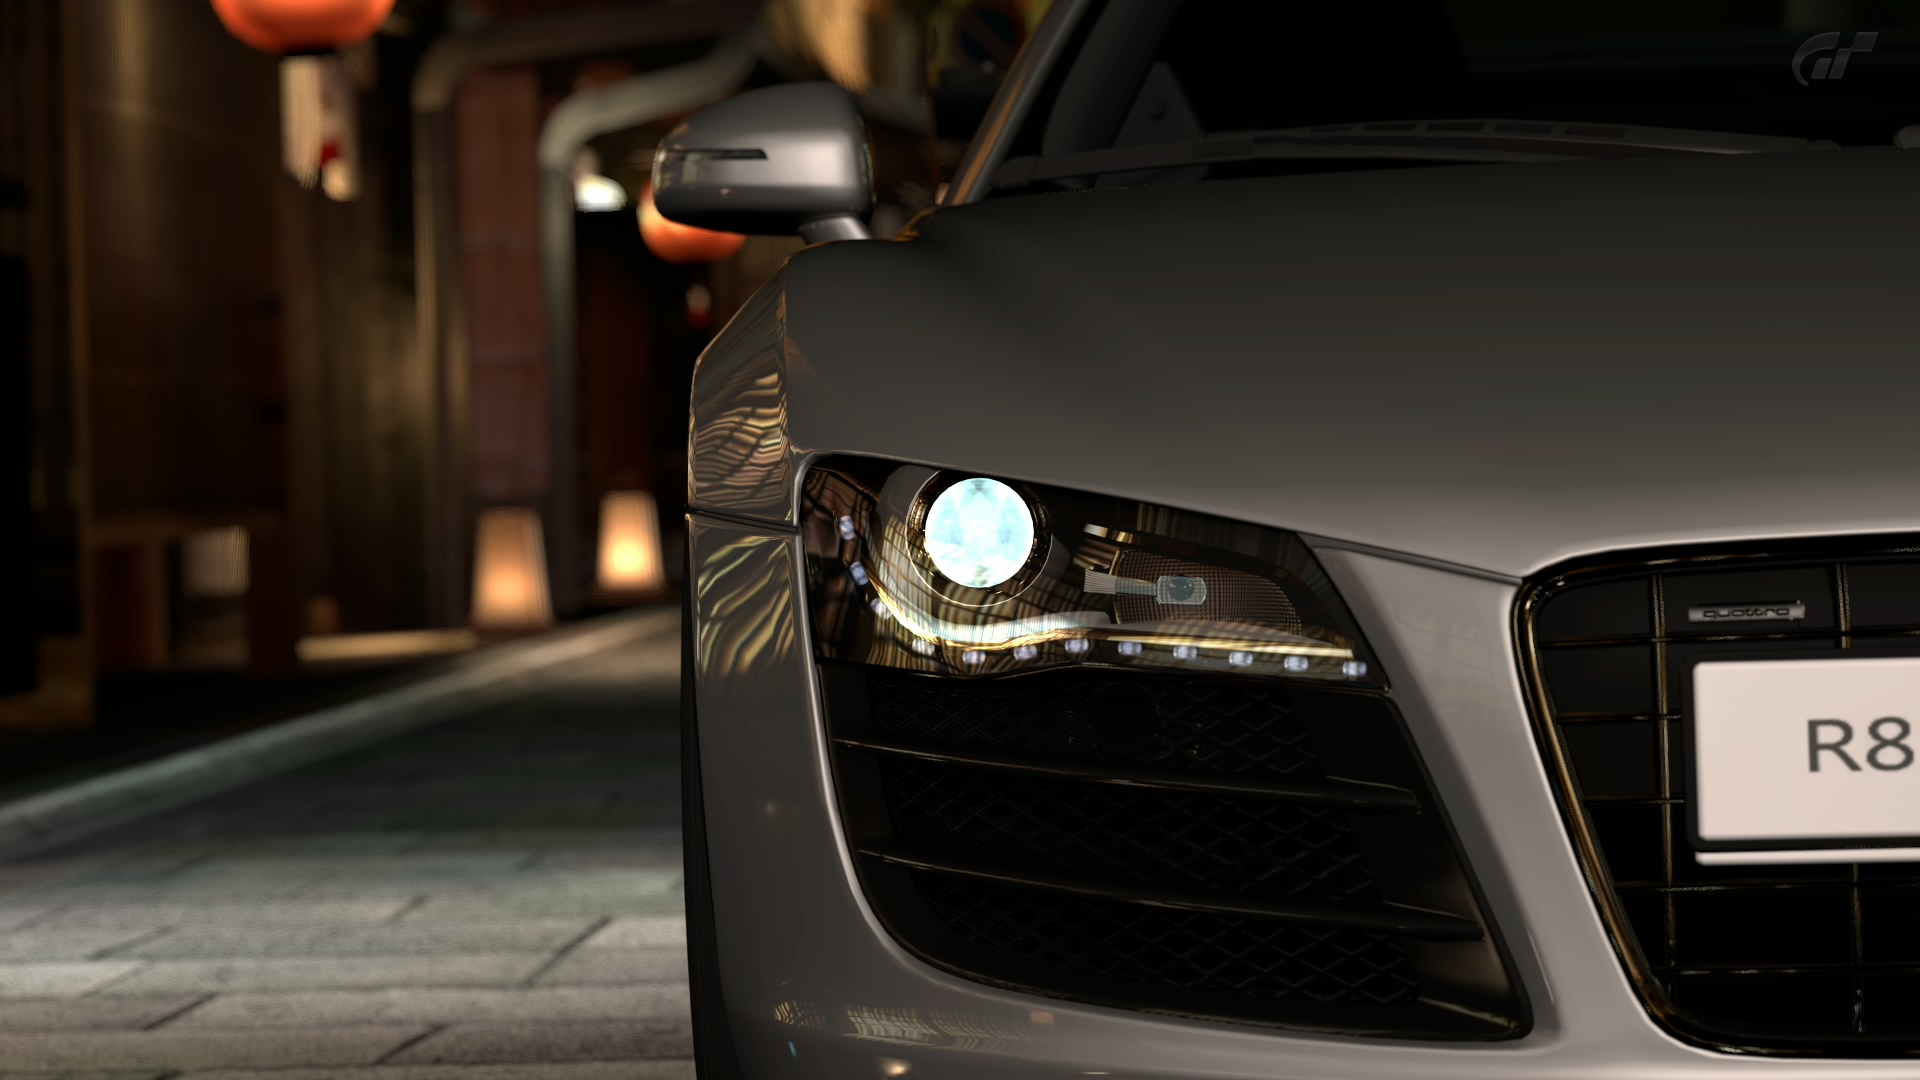 Audi HD Wallpaper | Background Image | 1920x1080 | ID ...